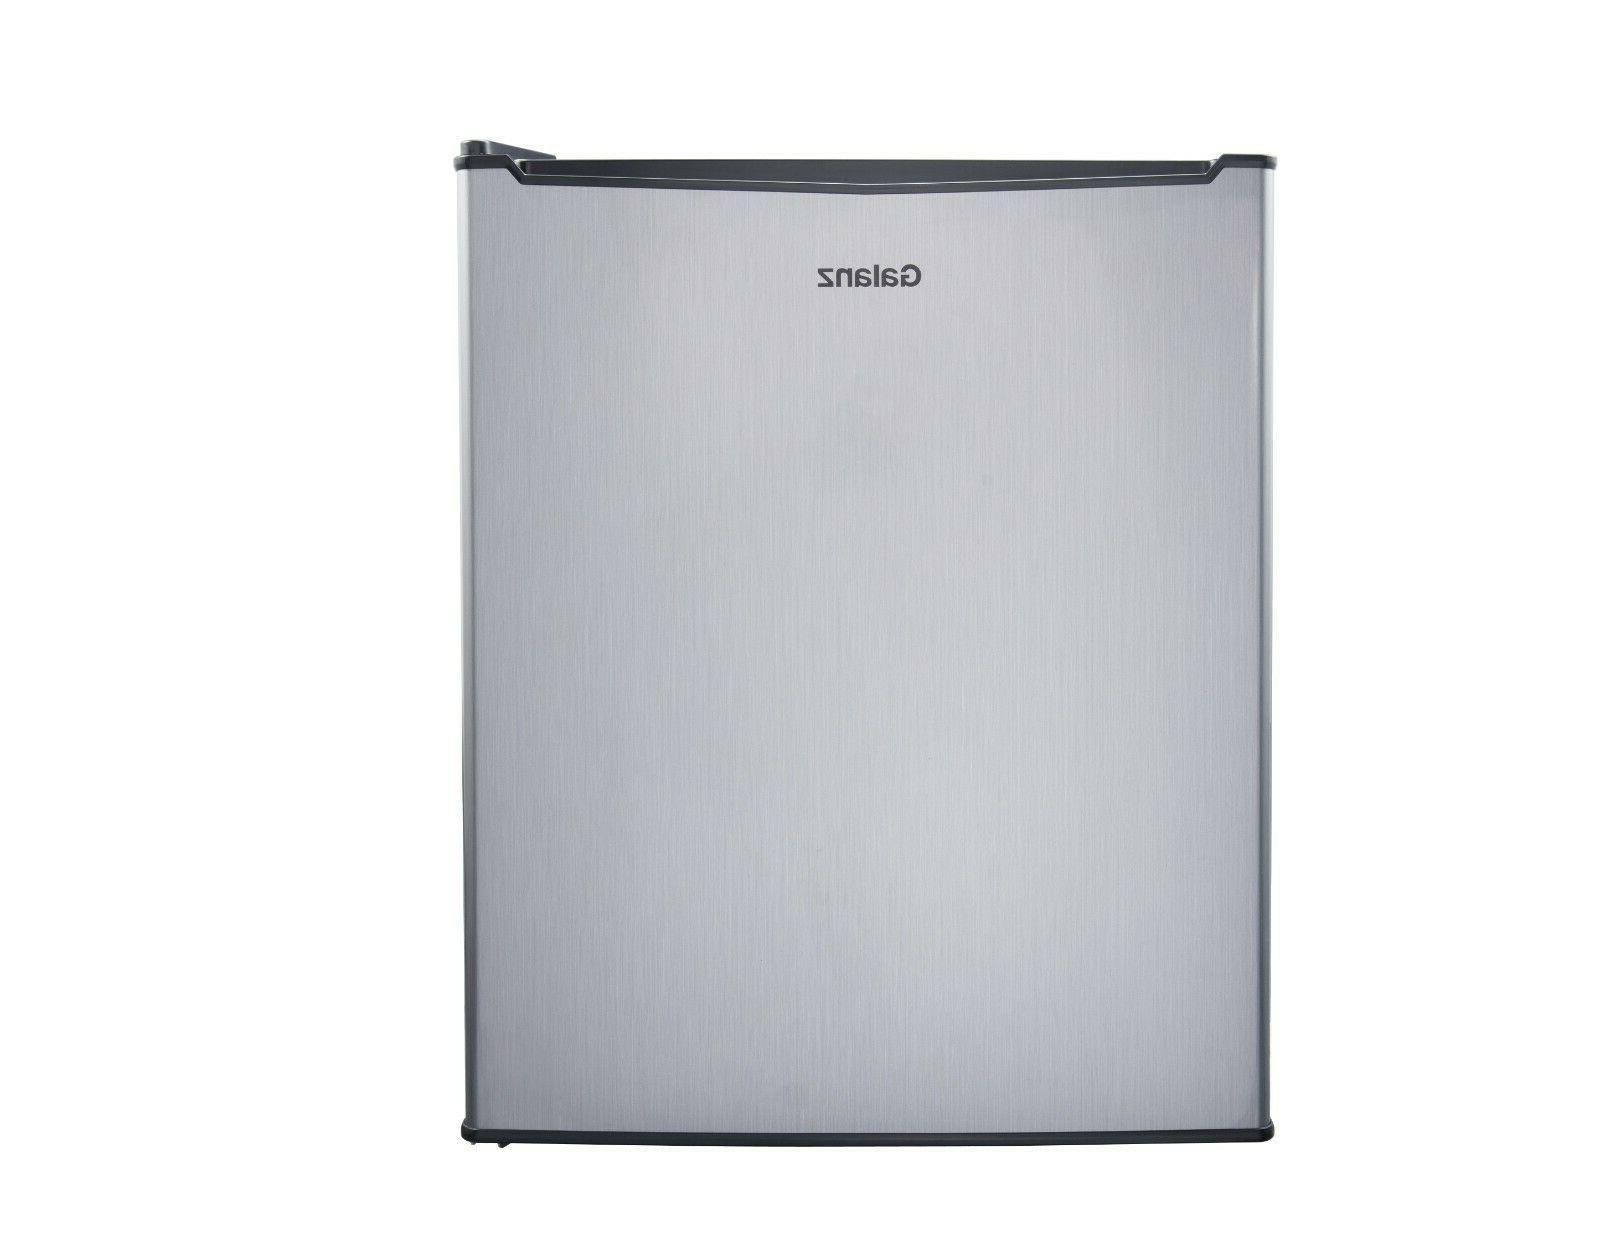 Galanz Cu Ft Single Fridge Freezer Conpact Small